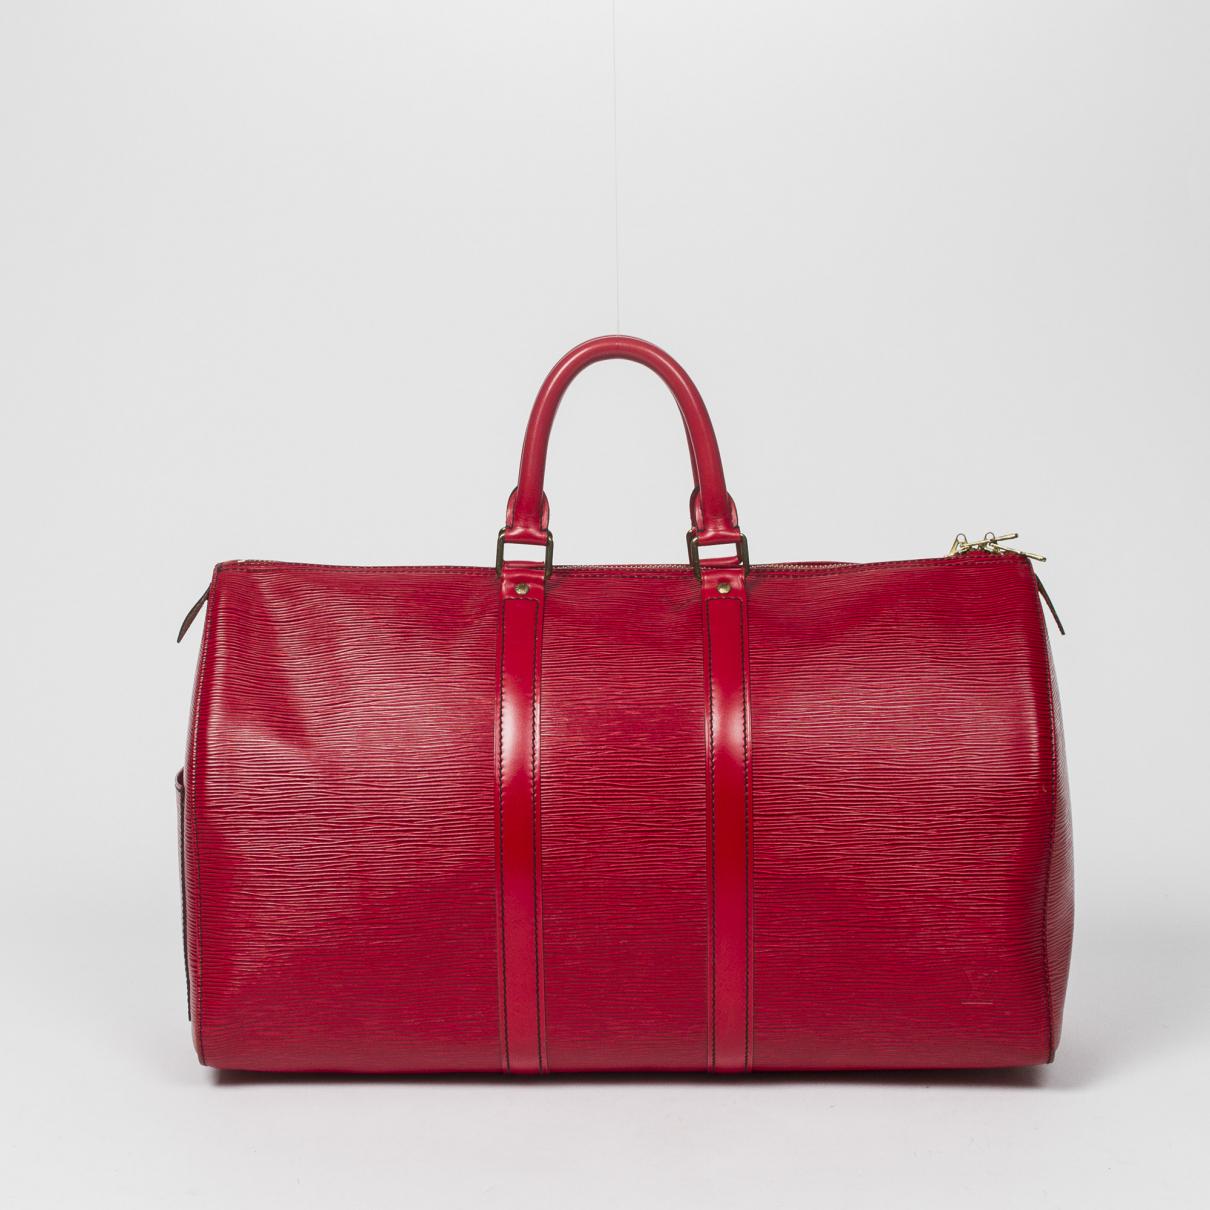 Louis Vuitton Keepall Reisetasche in  Rot Leder